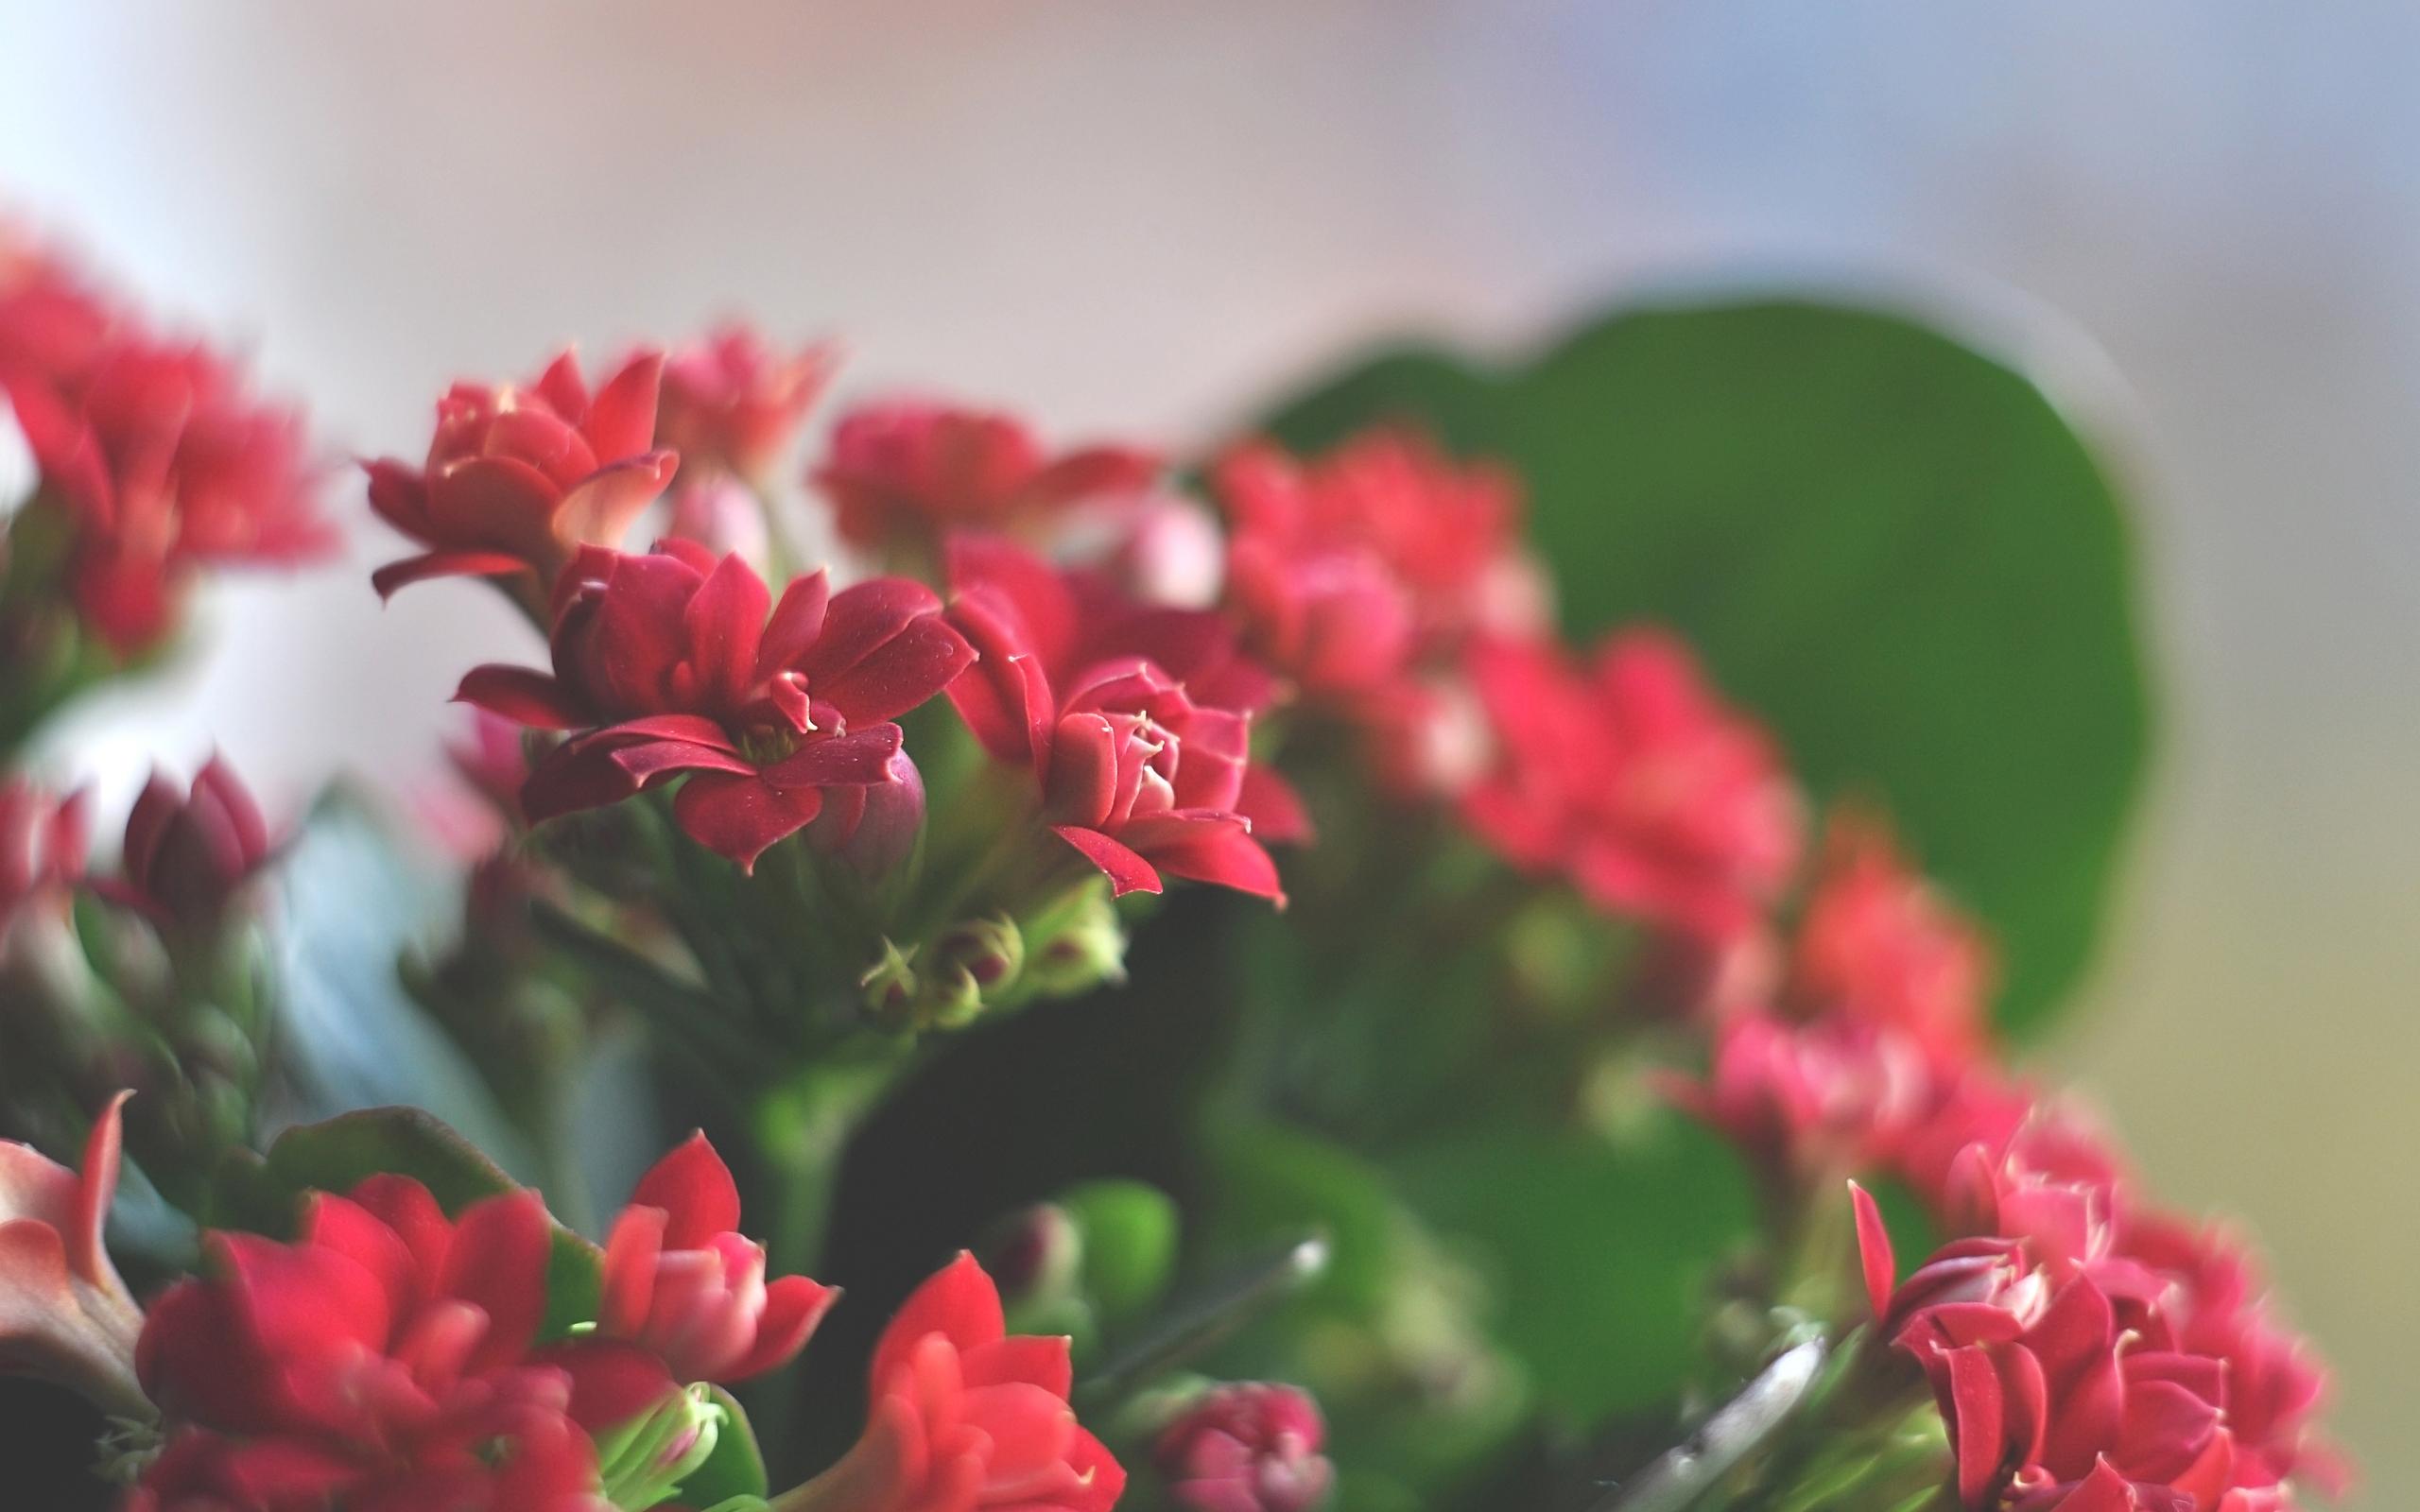 Wallpaper beautiful red flowers beautiful flowers spring beautiful red flowers mightylinksfo